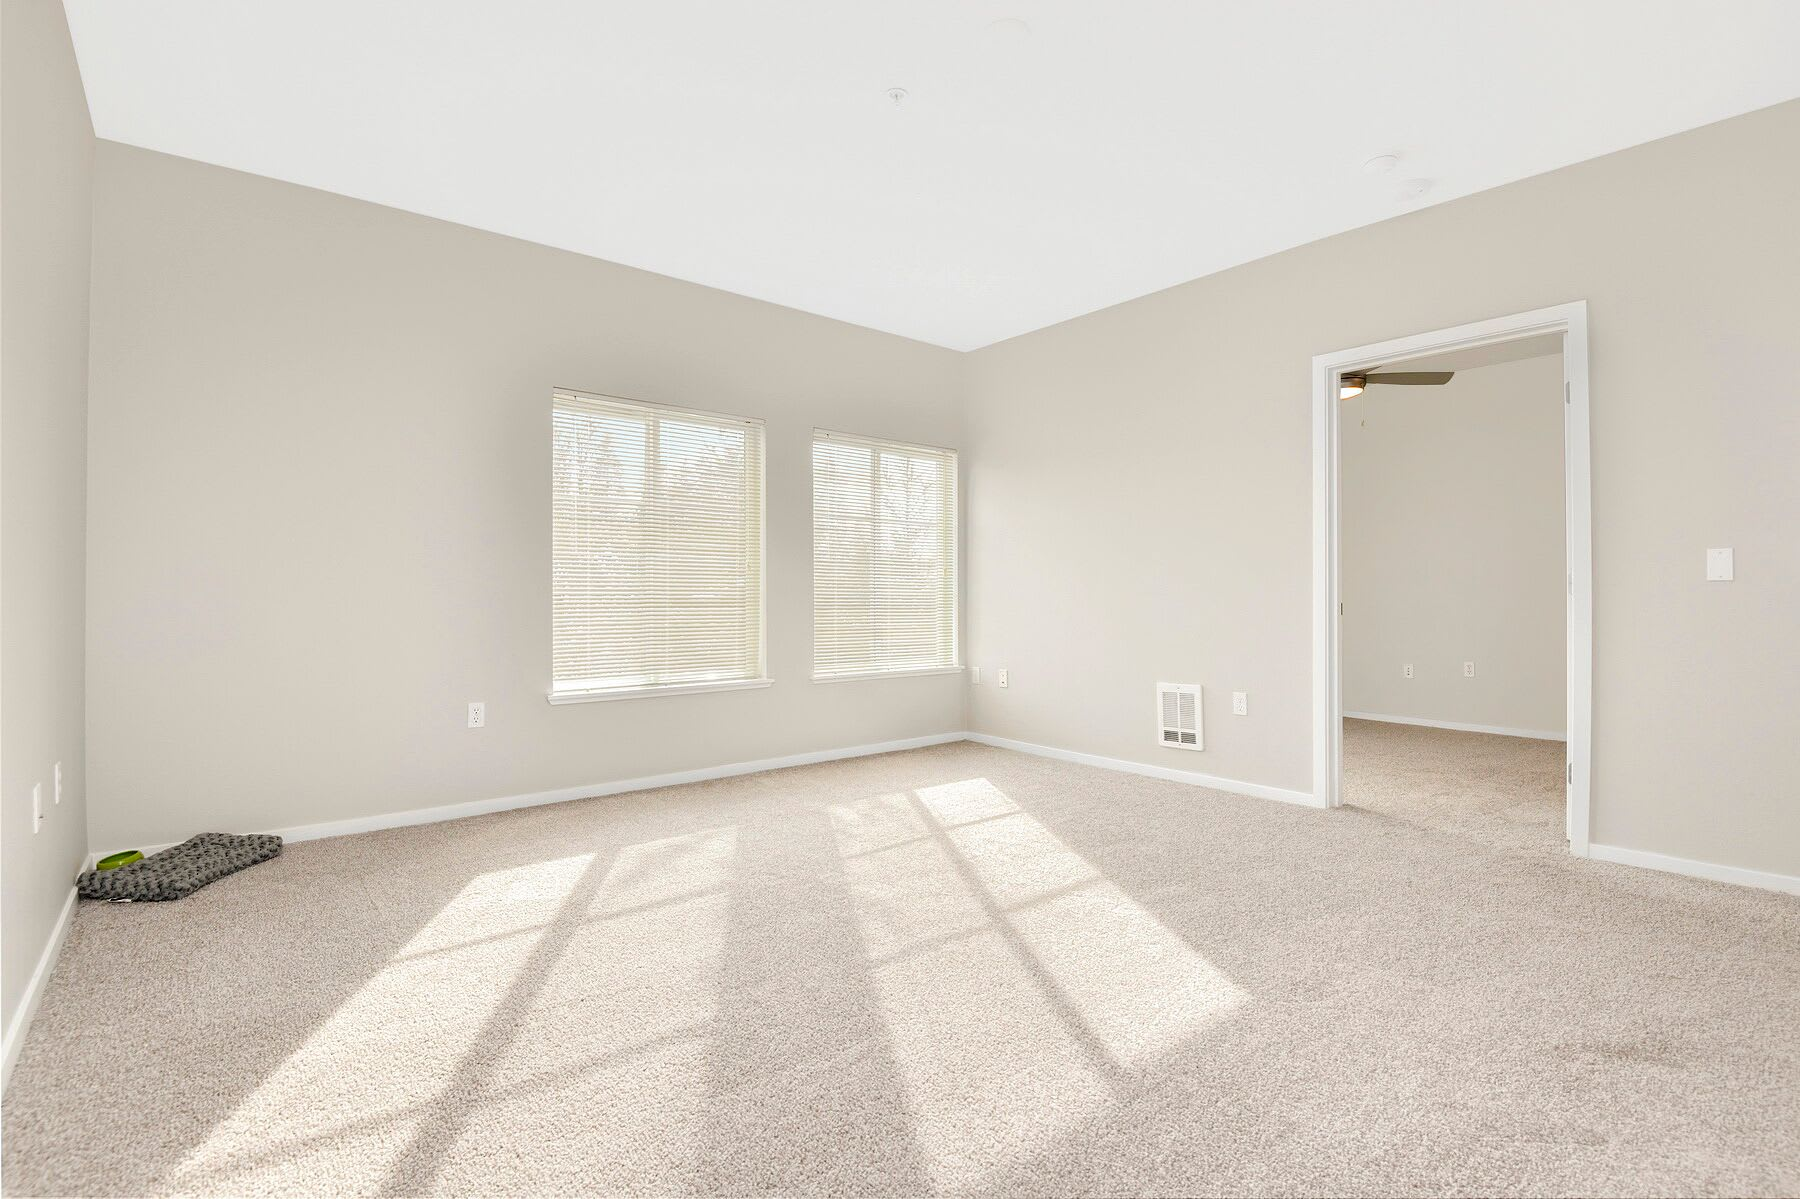 Redesigned Apartment Homes at Reunion at Redmond Ridge, Washington, 98053